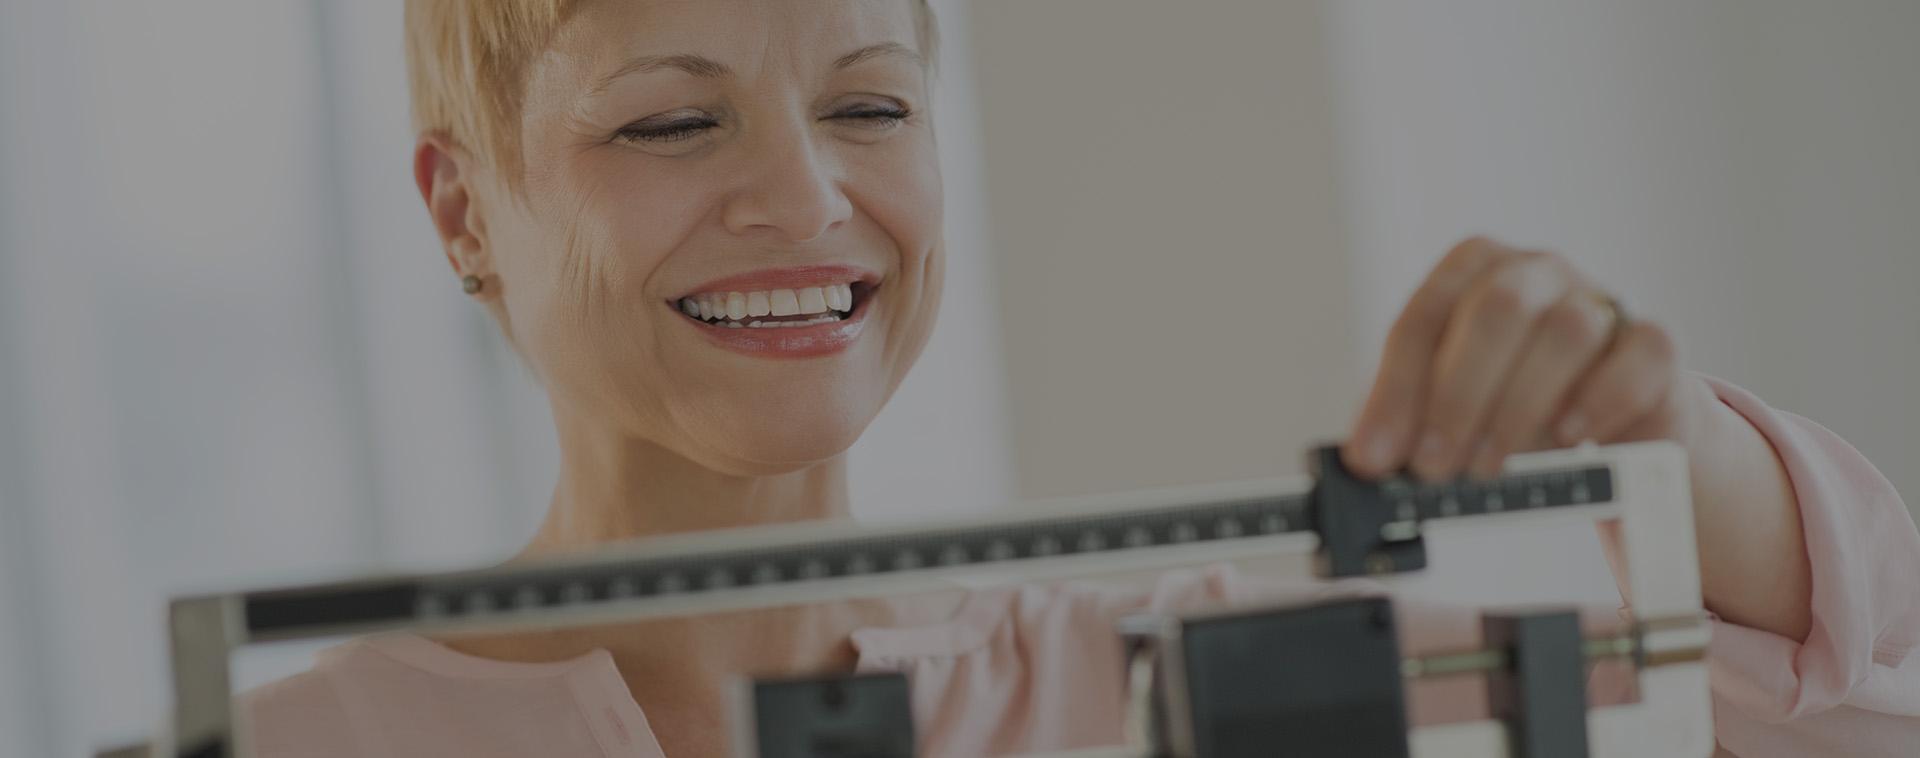 Home Slider Person Weiging Themself